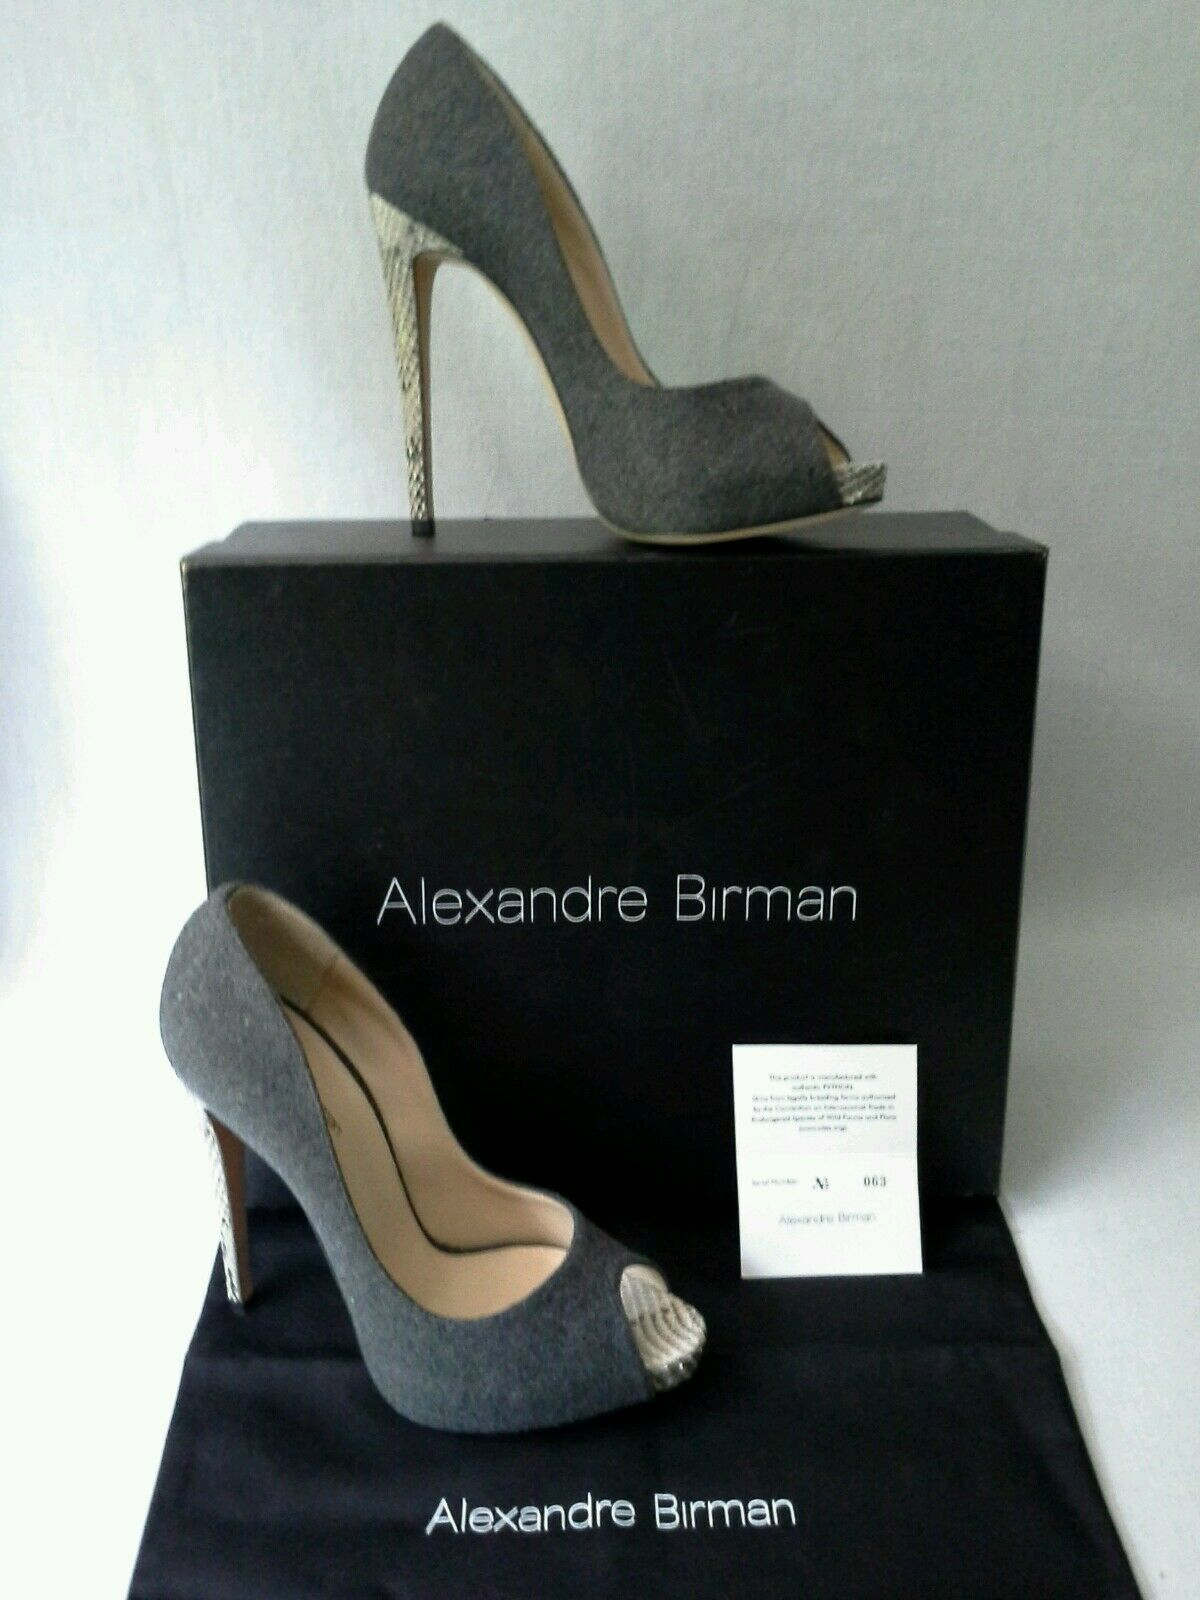 Alexandre Birman Hilary Stiletto bombas de lana Pitón Piel Piel Piel De Serpiente Talla 7 38 Italia  815  envío gratuito a nivel mundial